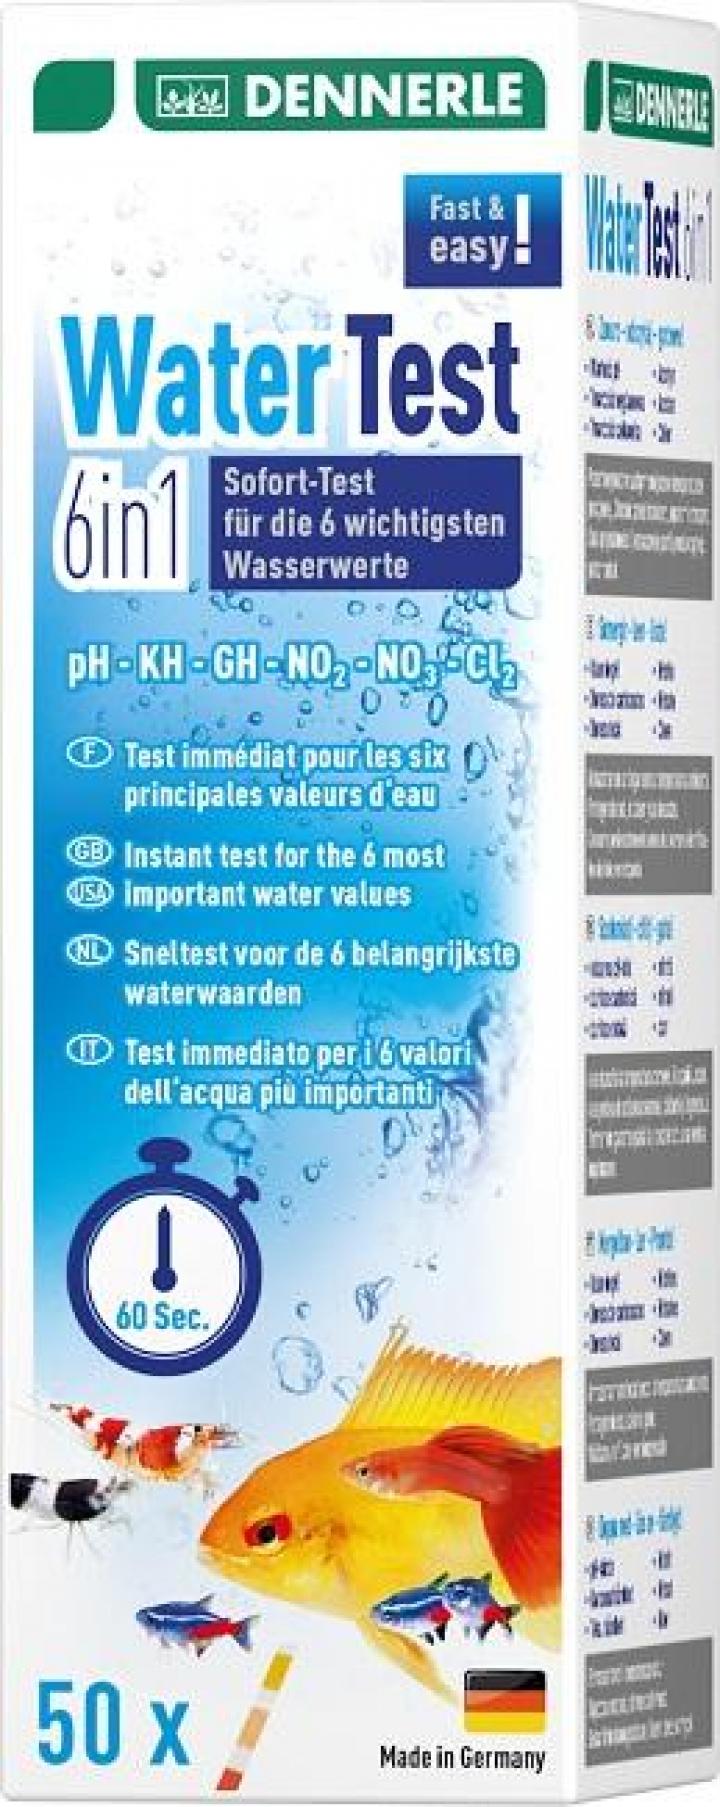 Dennerle - Aquatics - water test 6 in 1 - 50 pcs.